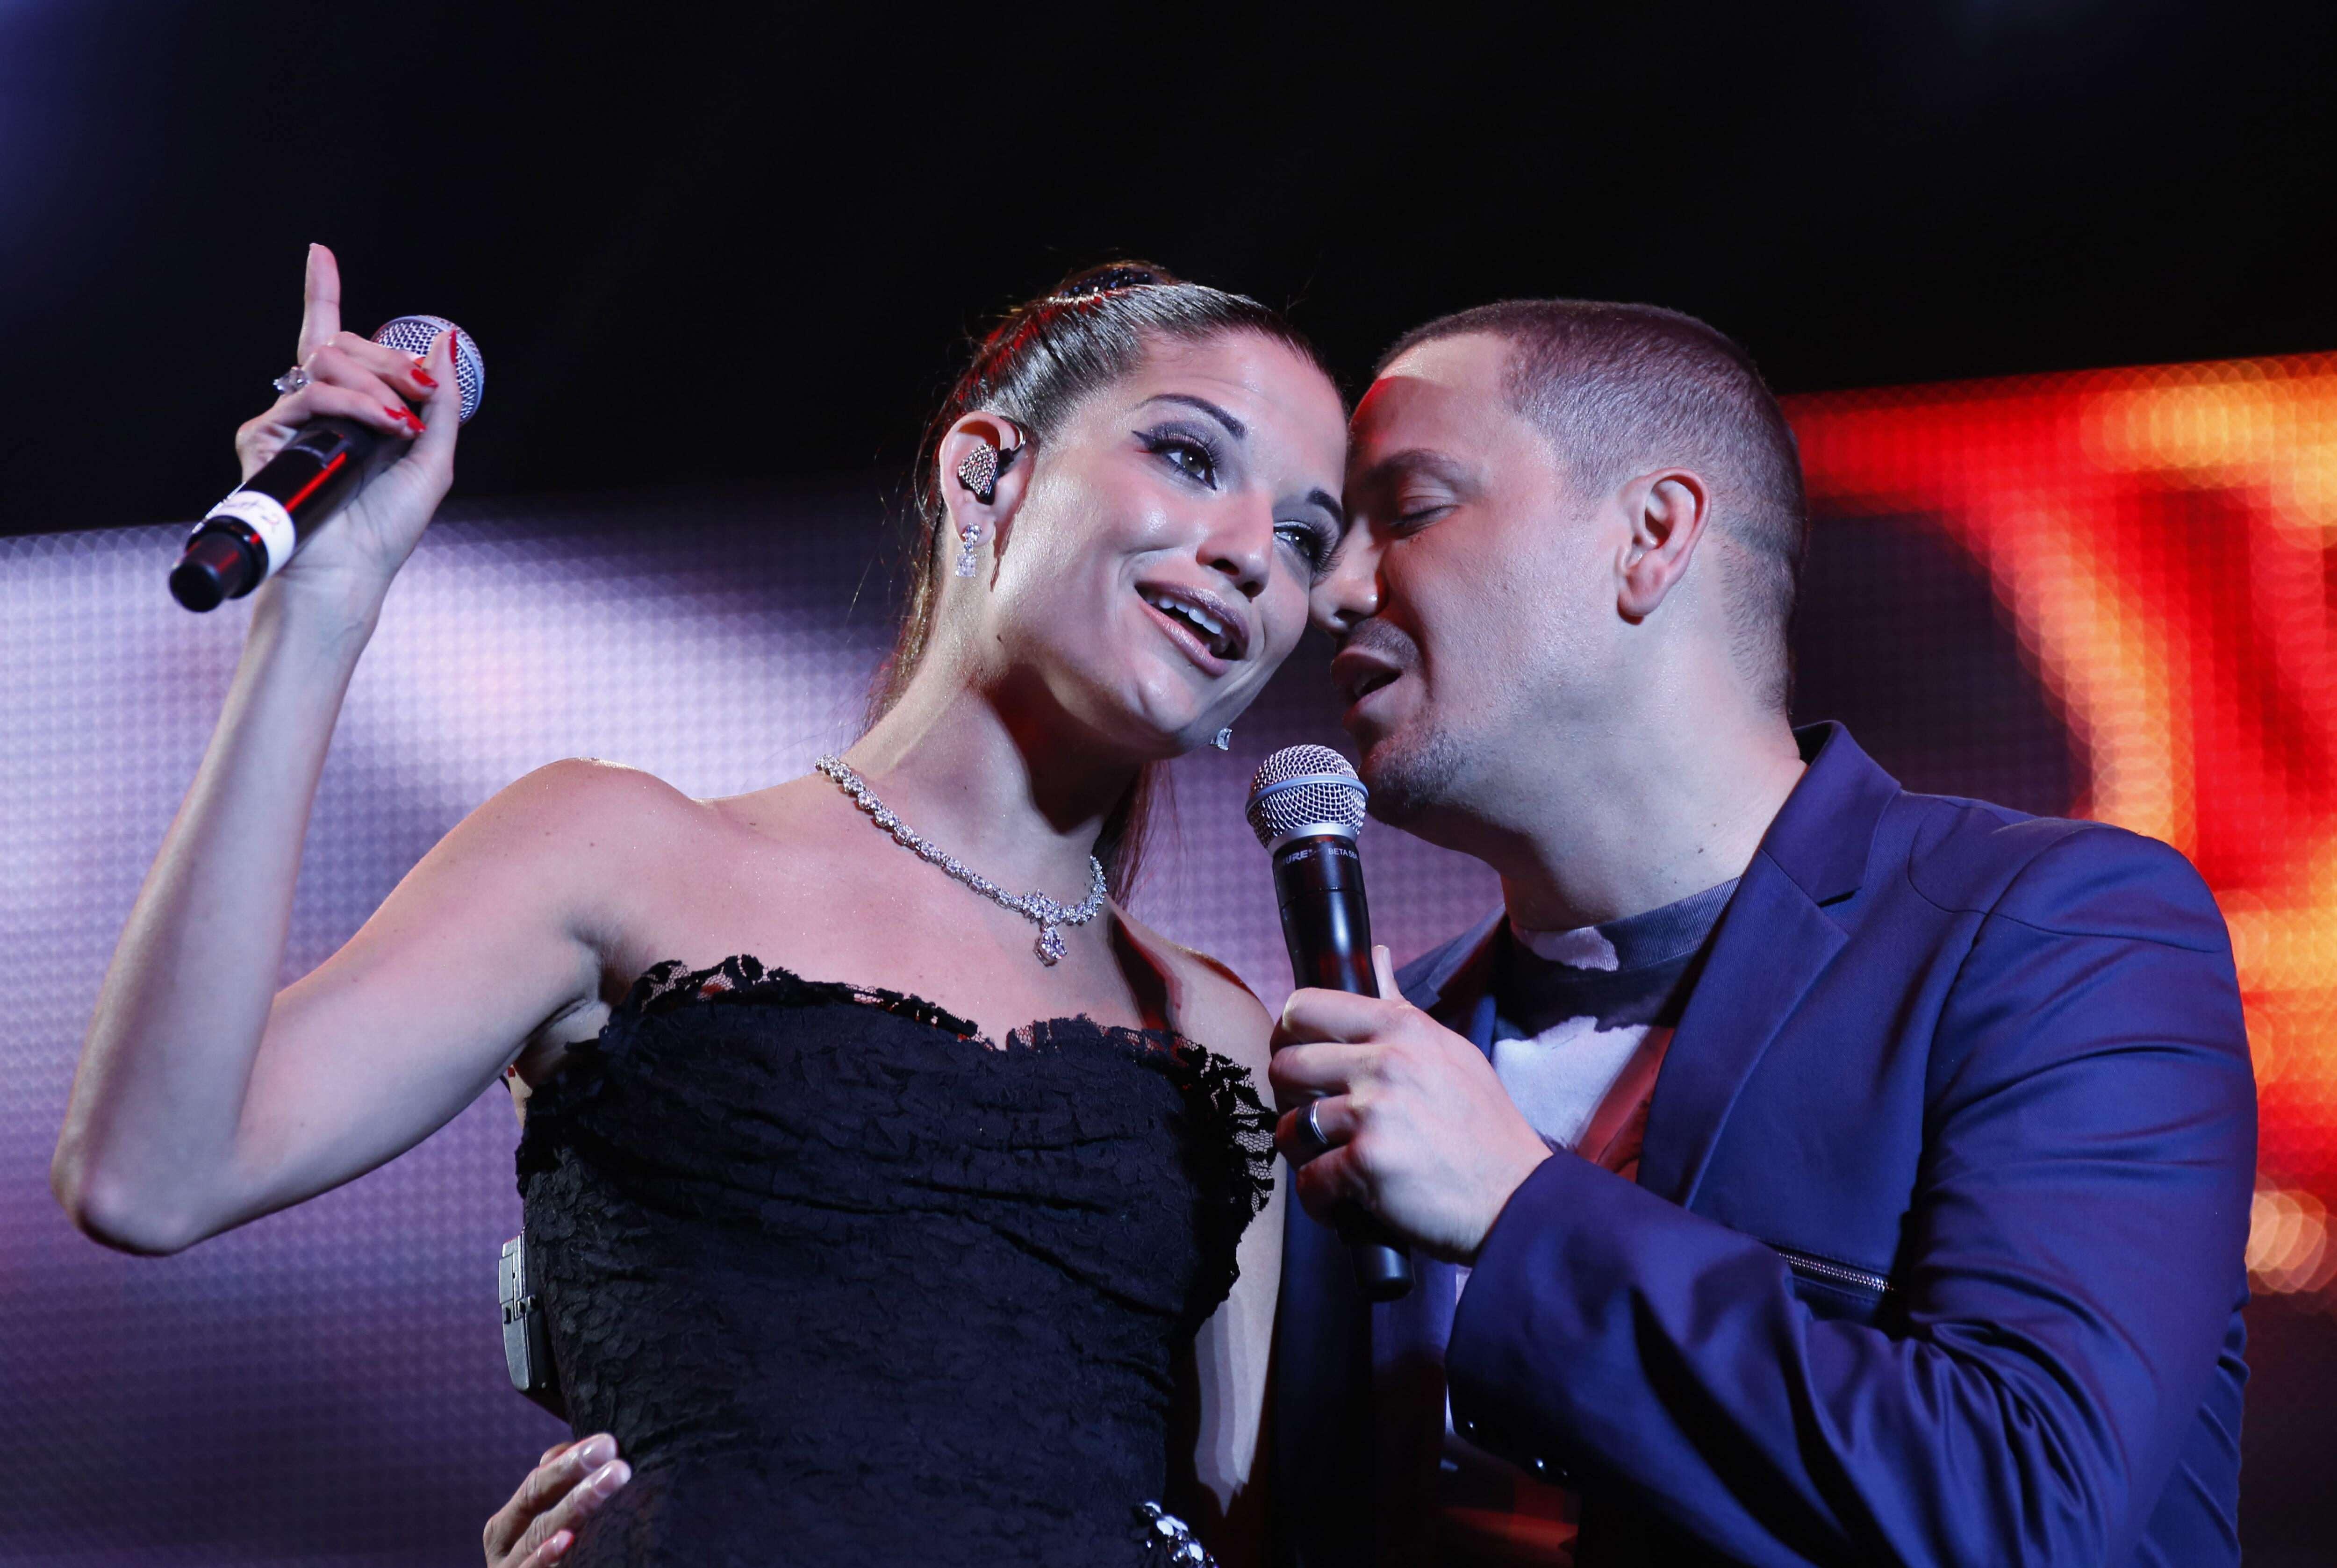 Fotos: Víctor Manuelle le canta al oído a Natalia Jiménez